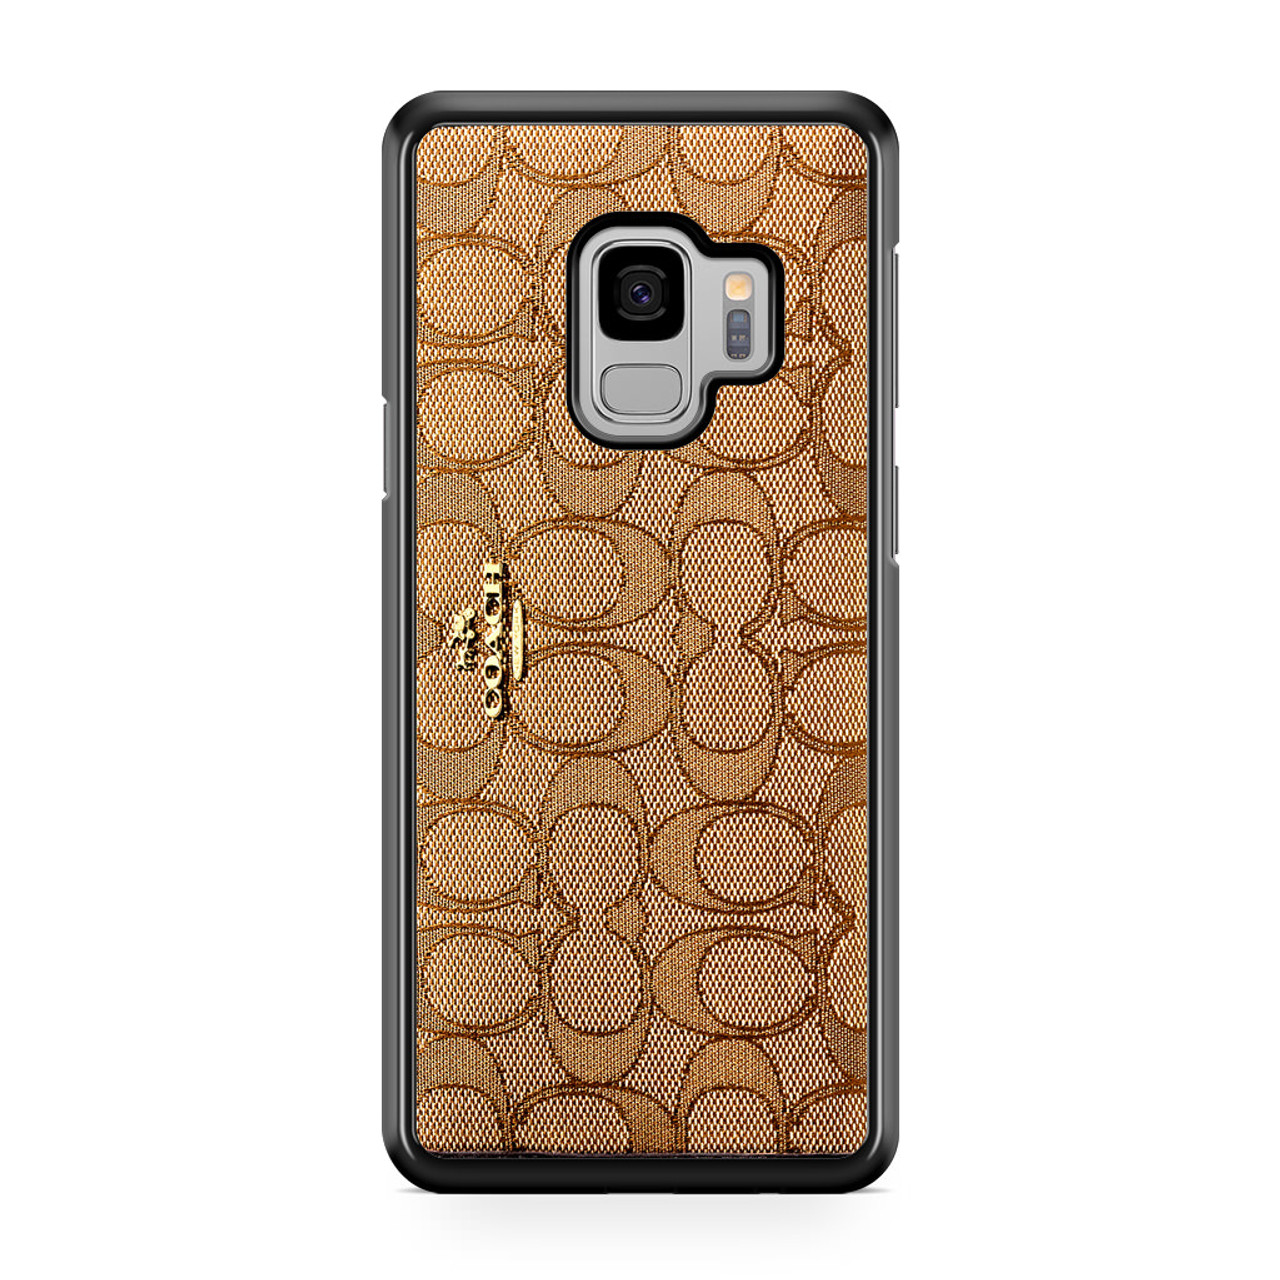 huge selection of c0416 43993 Coach Wallet Samsung Galaxy S9 Case